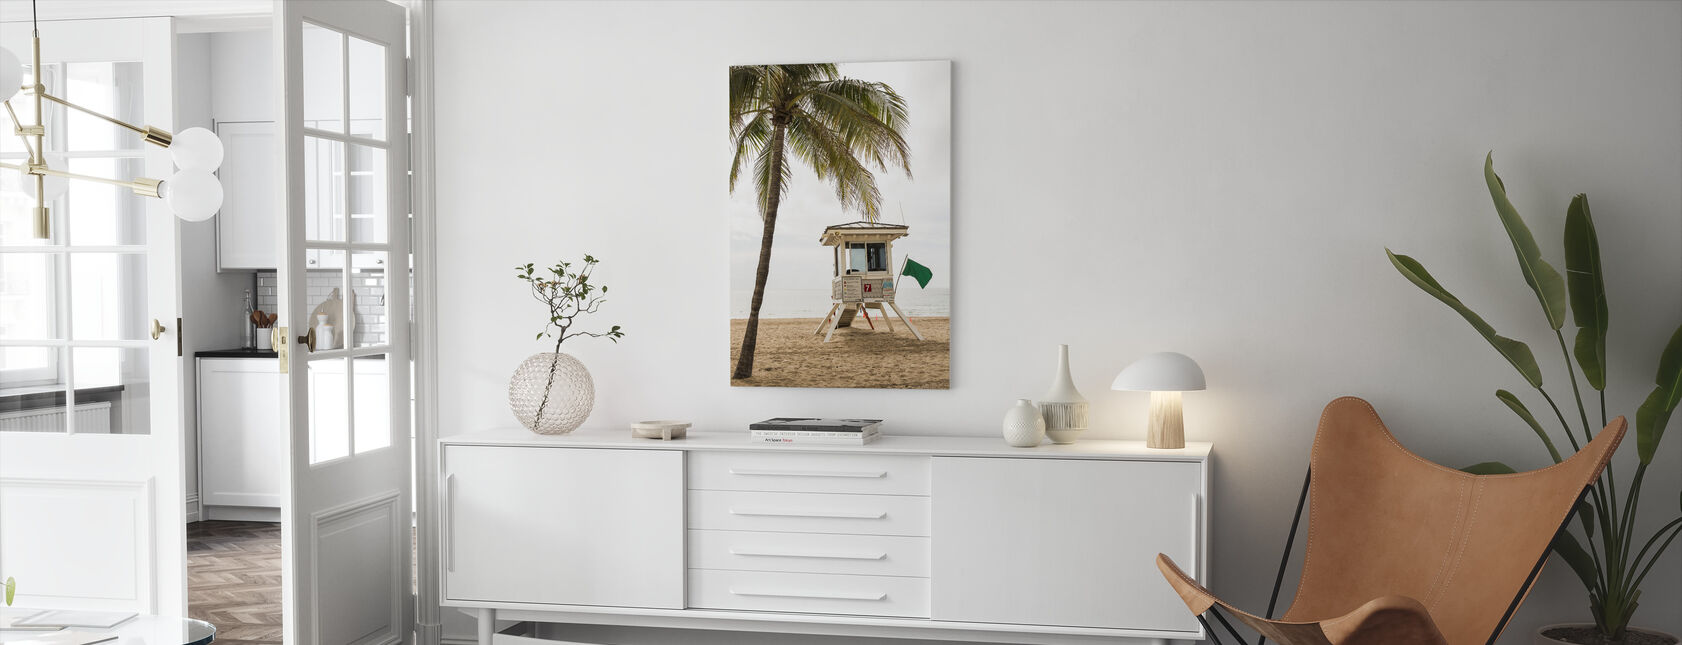 Green Flag on Florida Beach - Canvas print - Living Room